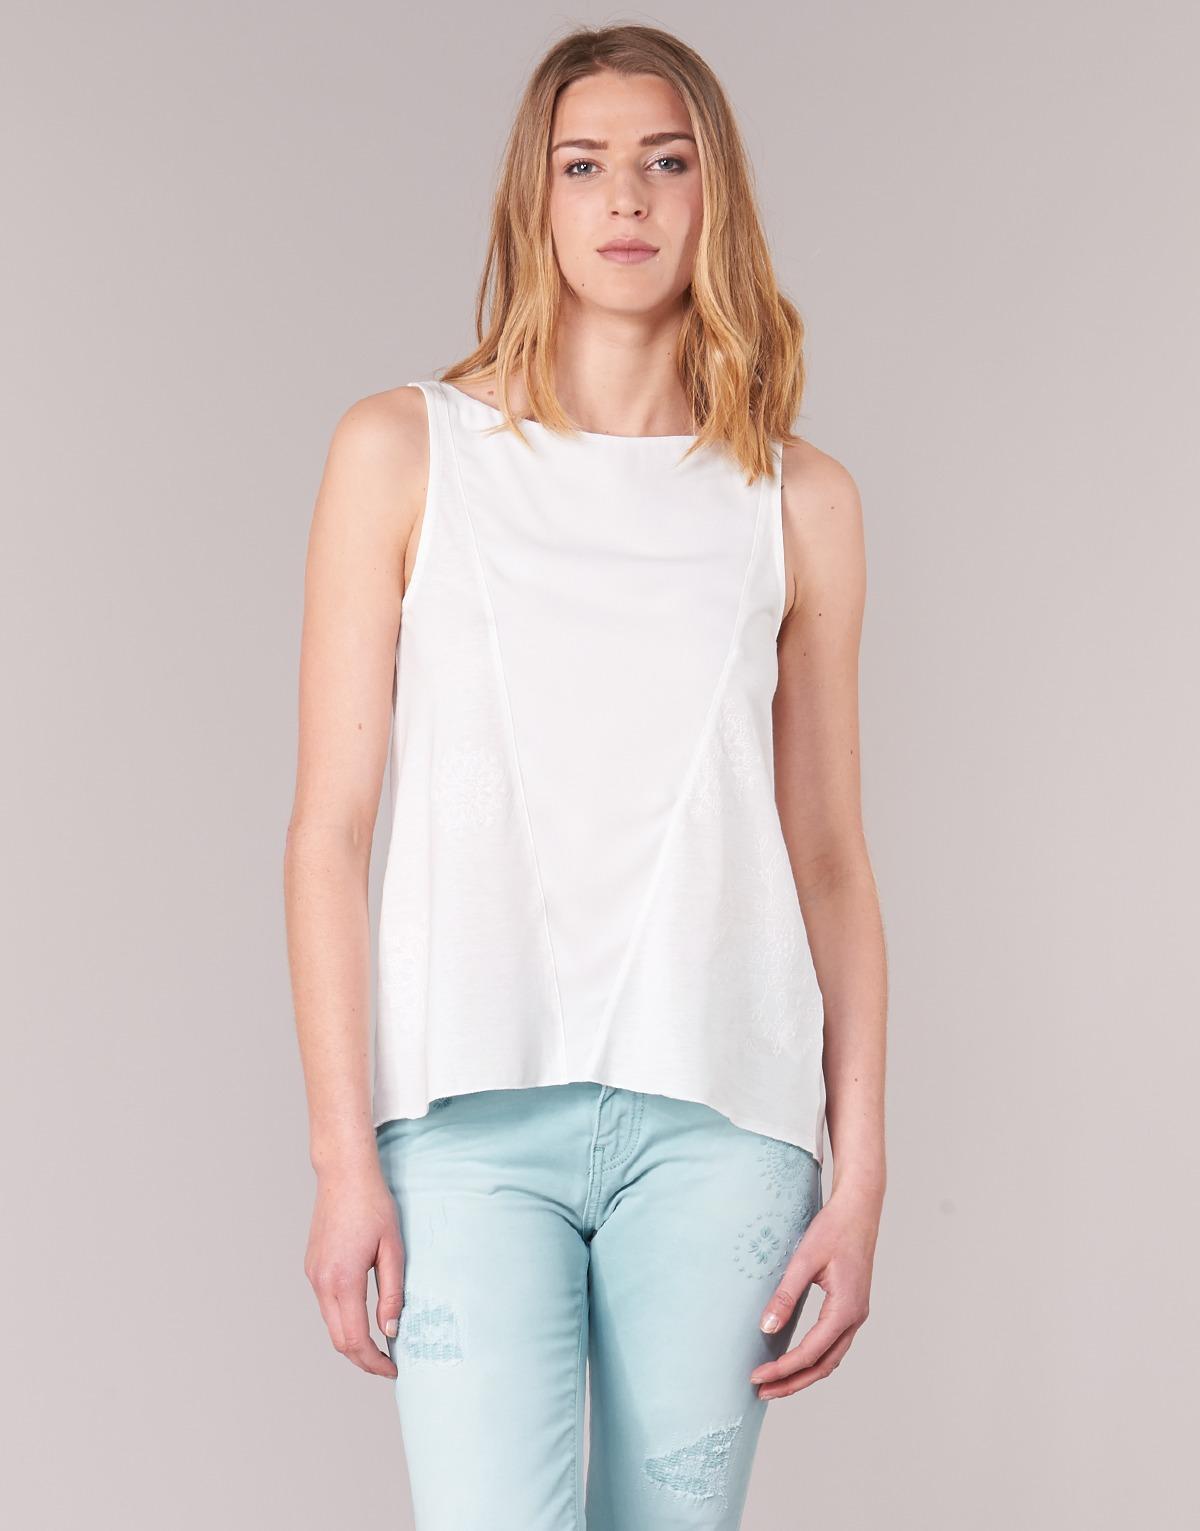 73a69a4c3737 Αμάνικα T-shirts χωρίς μανίκια Desigual ROMINESSA Σύνθεση  Βαμβάκι ...